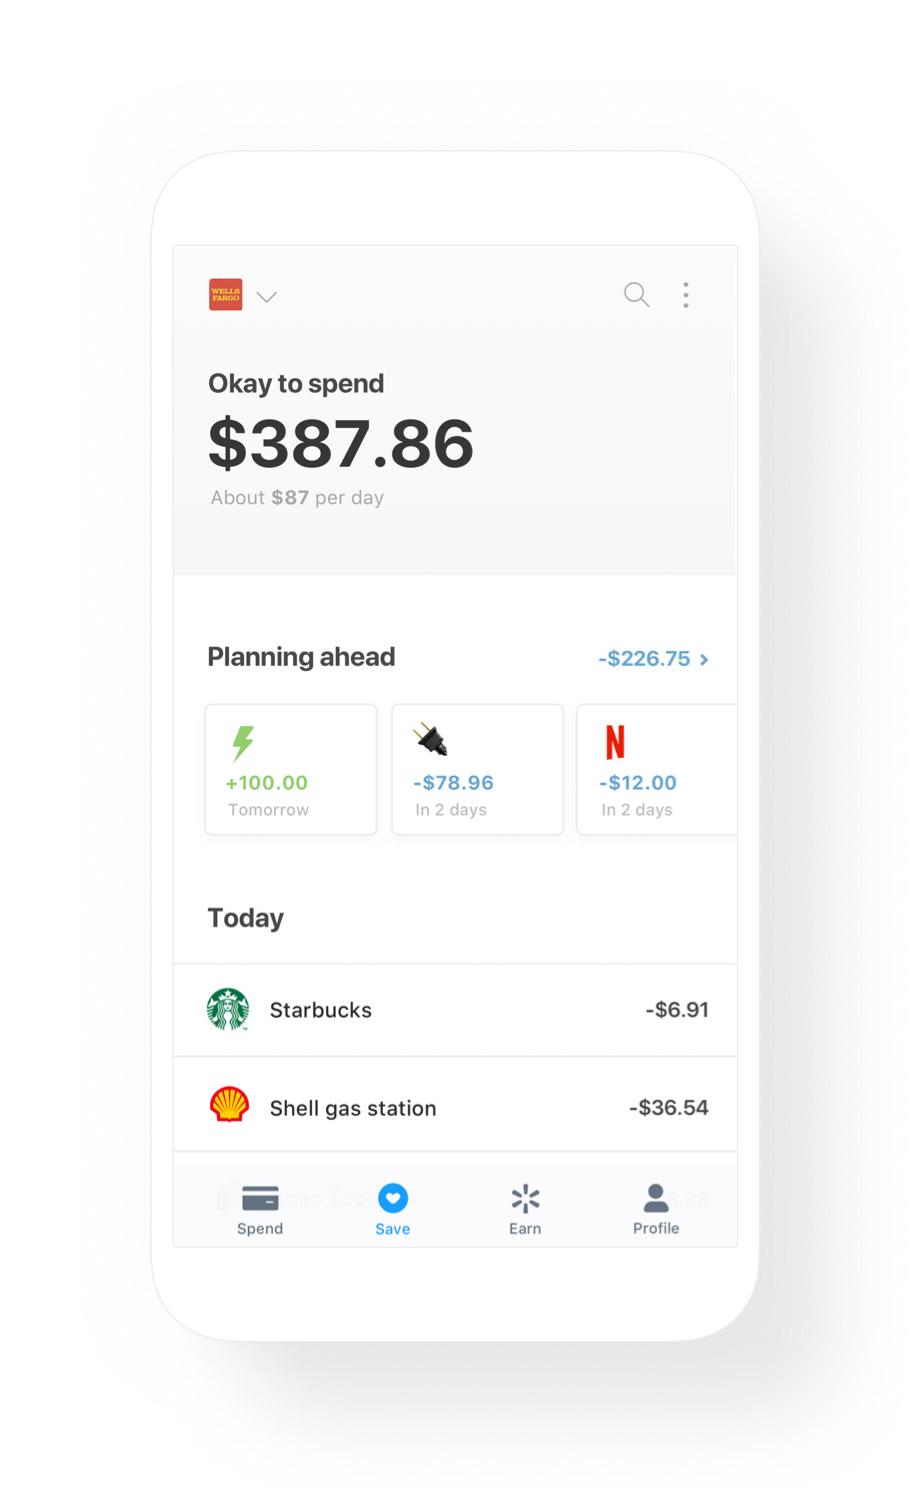 https://techcrunch com/2018/07/19/even-raises-40m-to